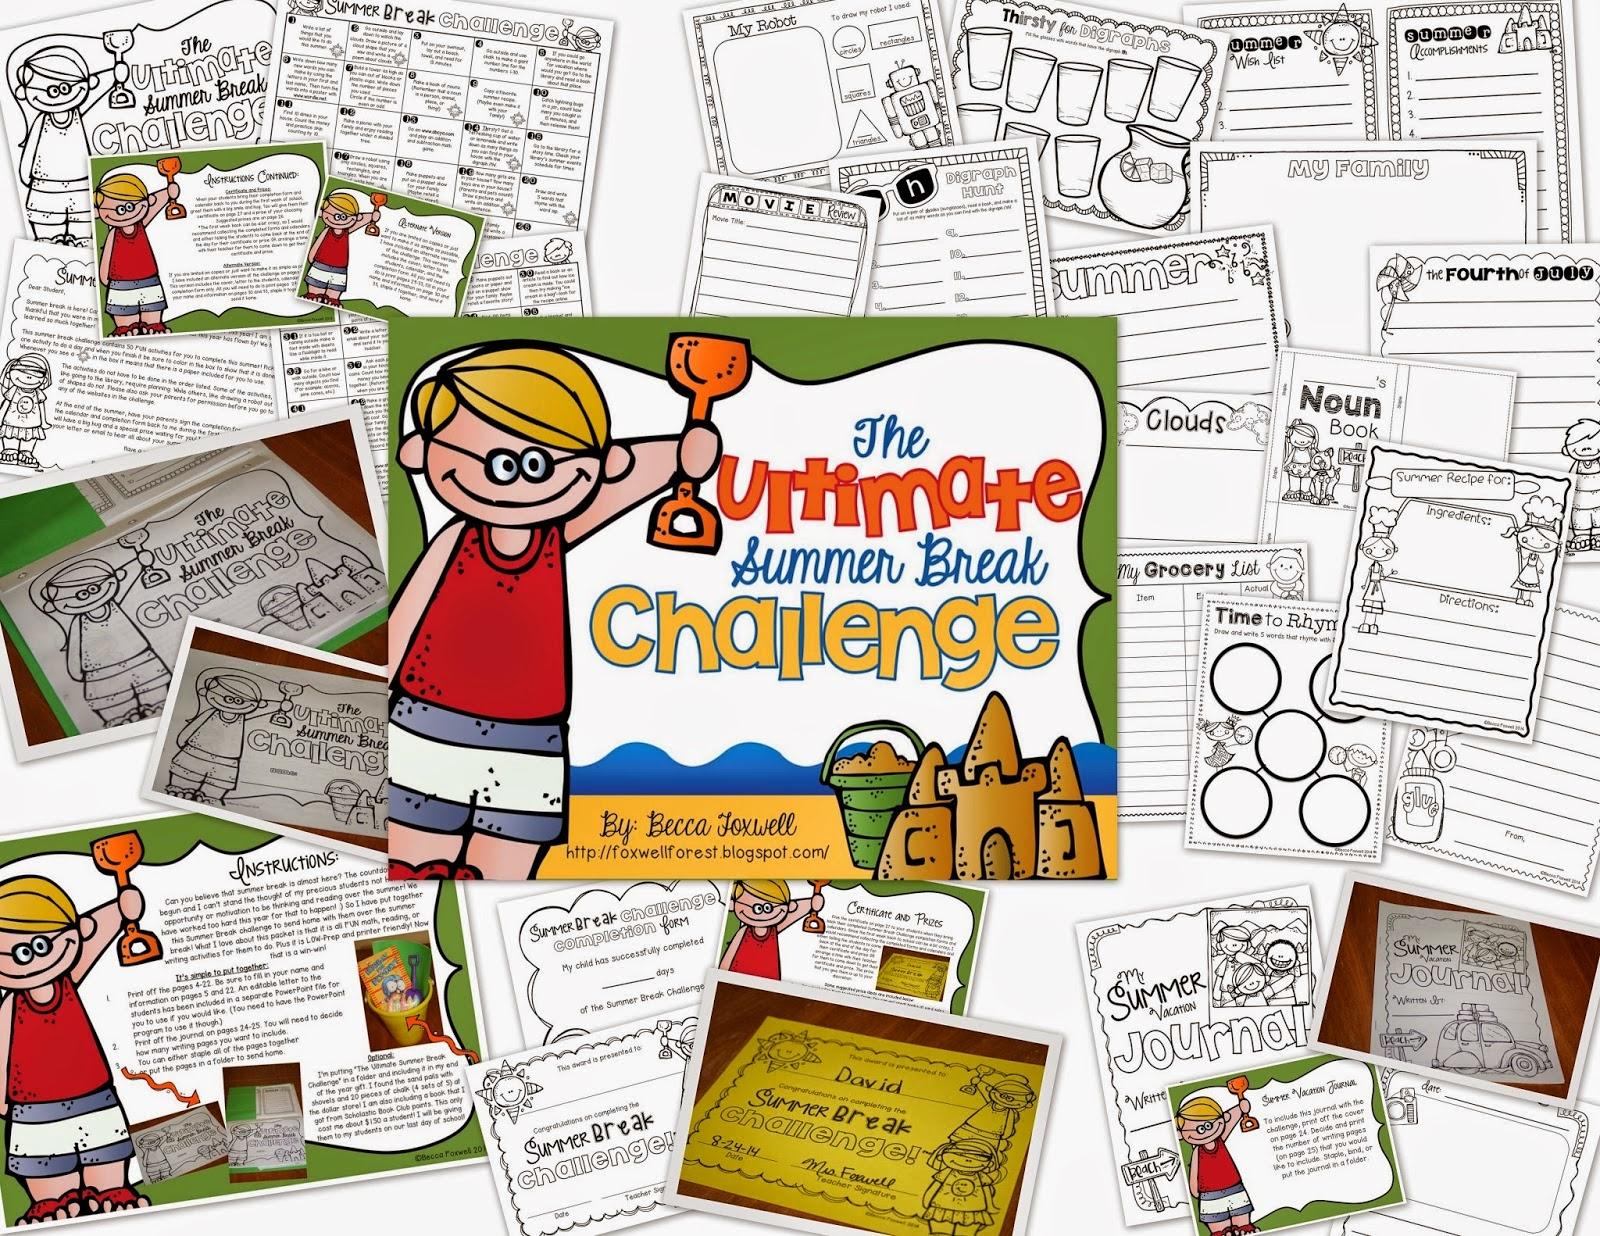 http://www.teacherspayteachers.com/Product/The-Ultimate-Summer-Break-Challenge-1233167